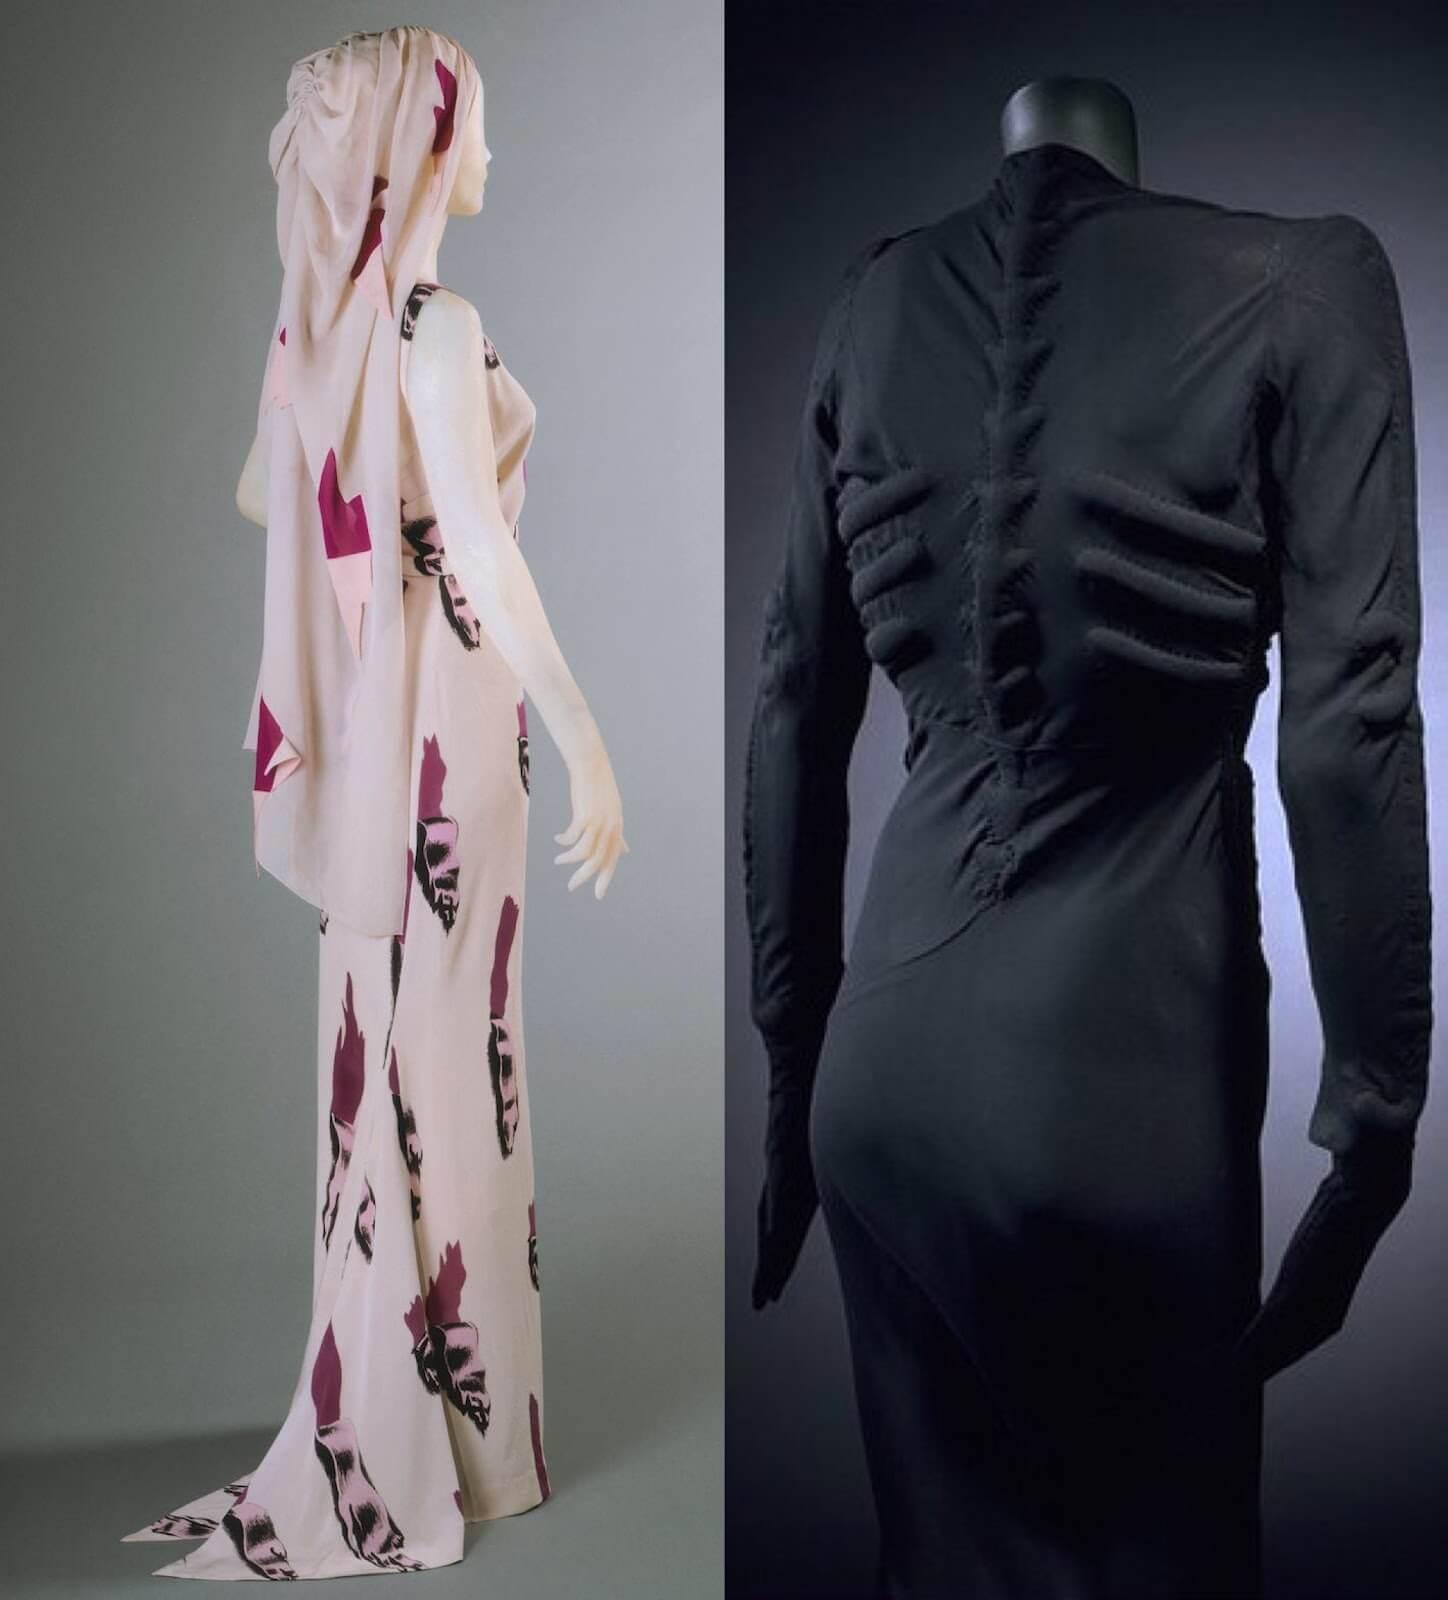 tear-dress-skeleton-dress-schiaparelli